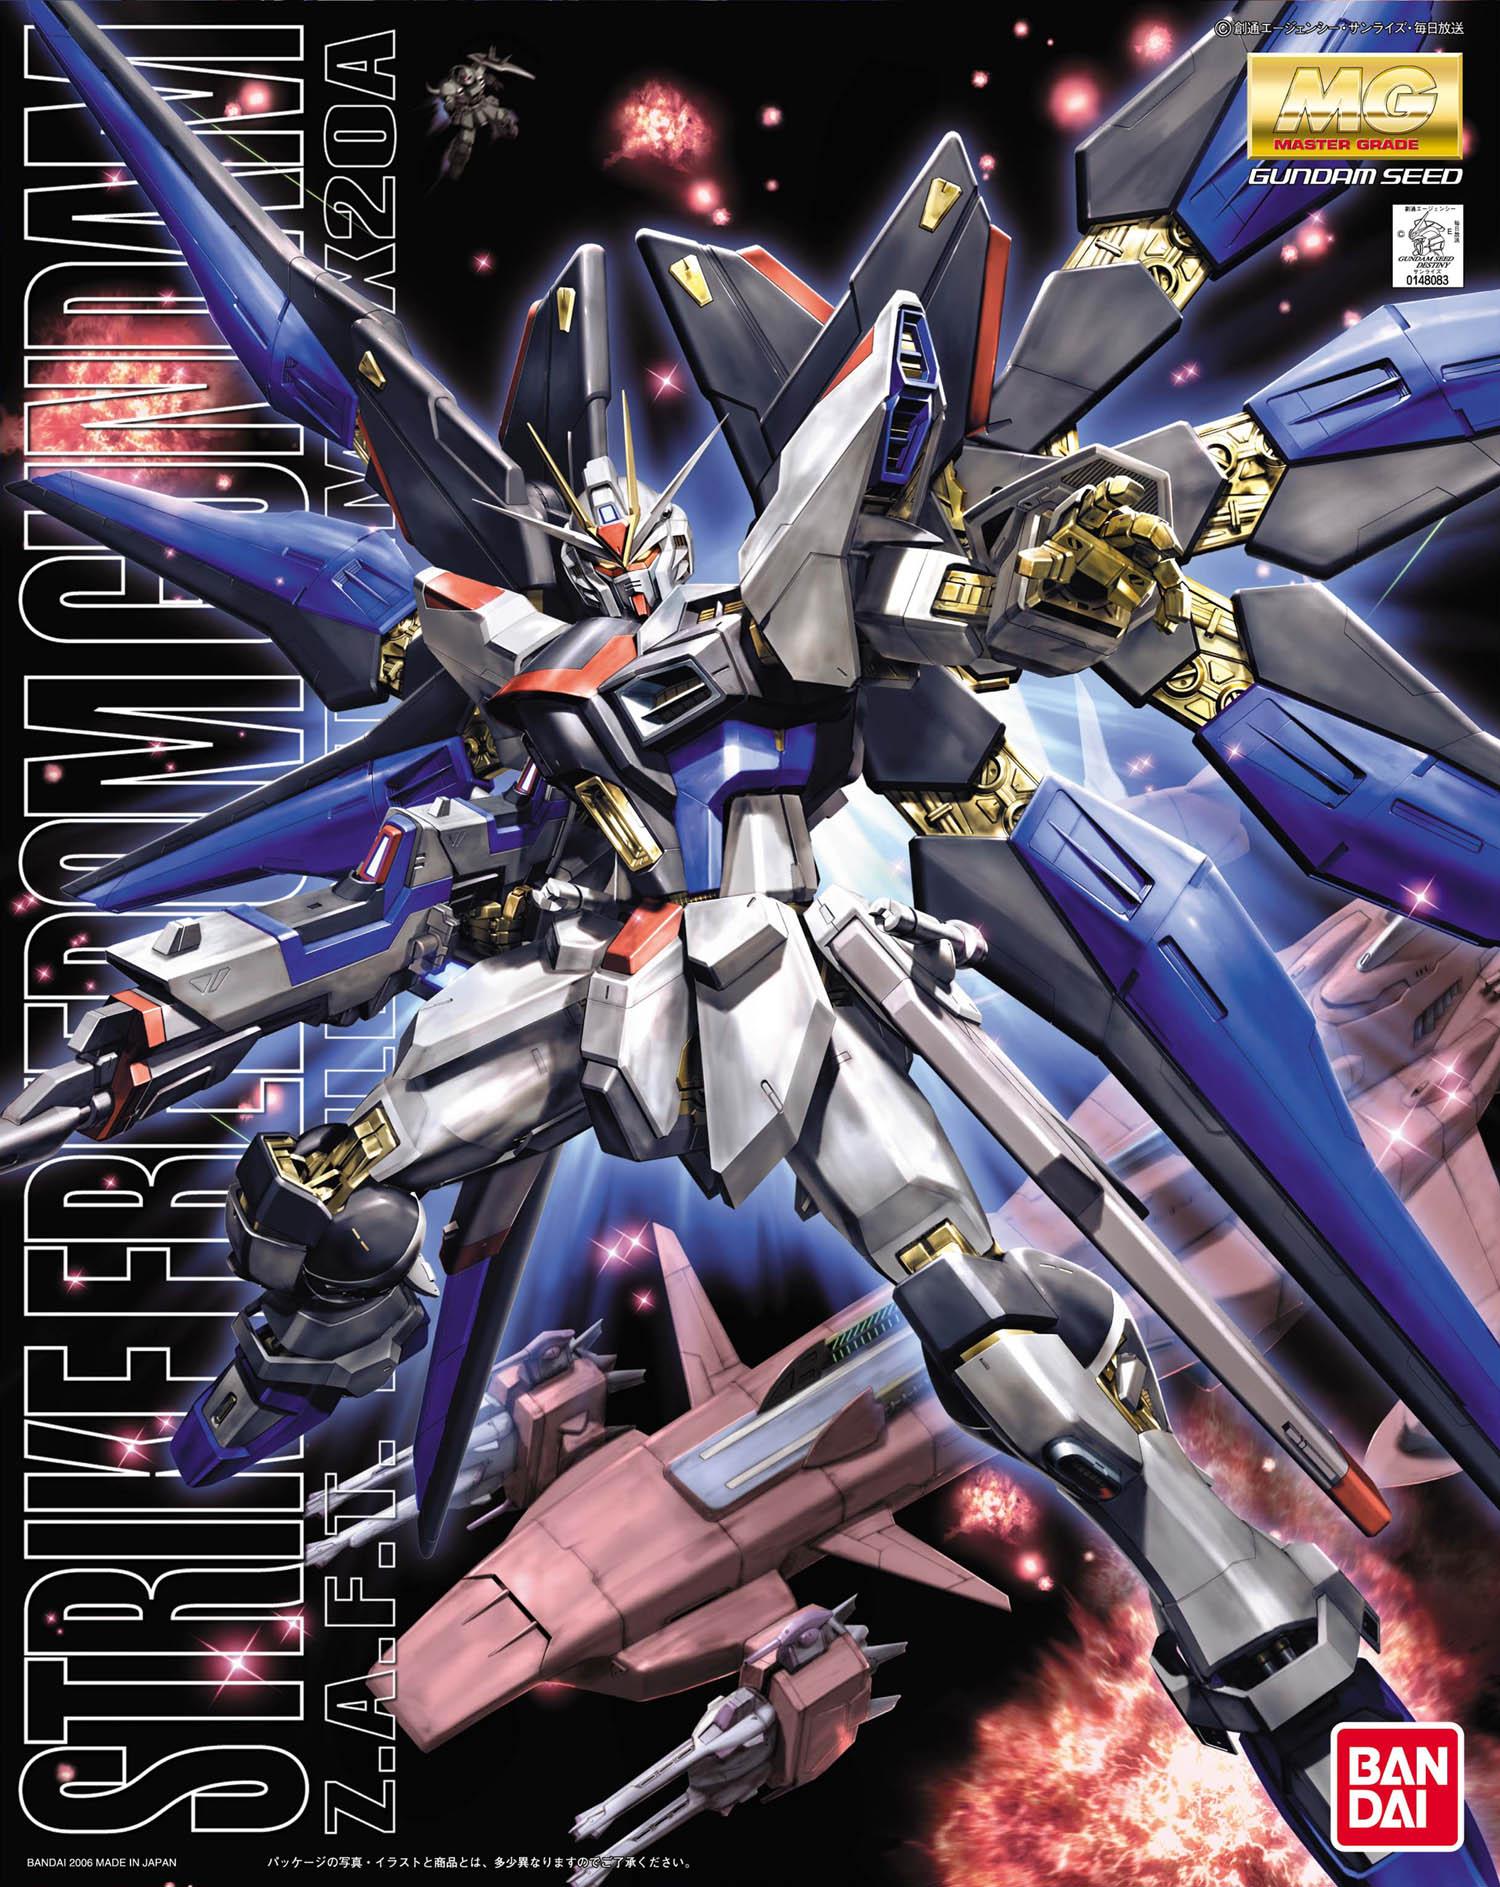 Bandai Gundam MG 1/100 STRIKE VRIJHEID Mobiele Pak Monteren Model Kits Actiefiguren Plastic Model Speelgoed-in Actie- & Speelgoedfiguren van Speelgoed & Hobbies op  Groep 1